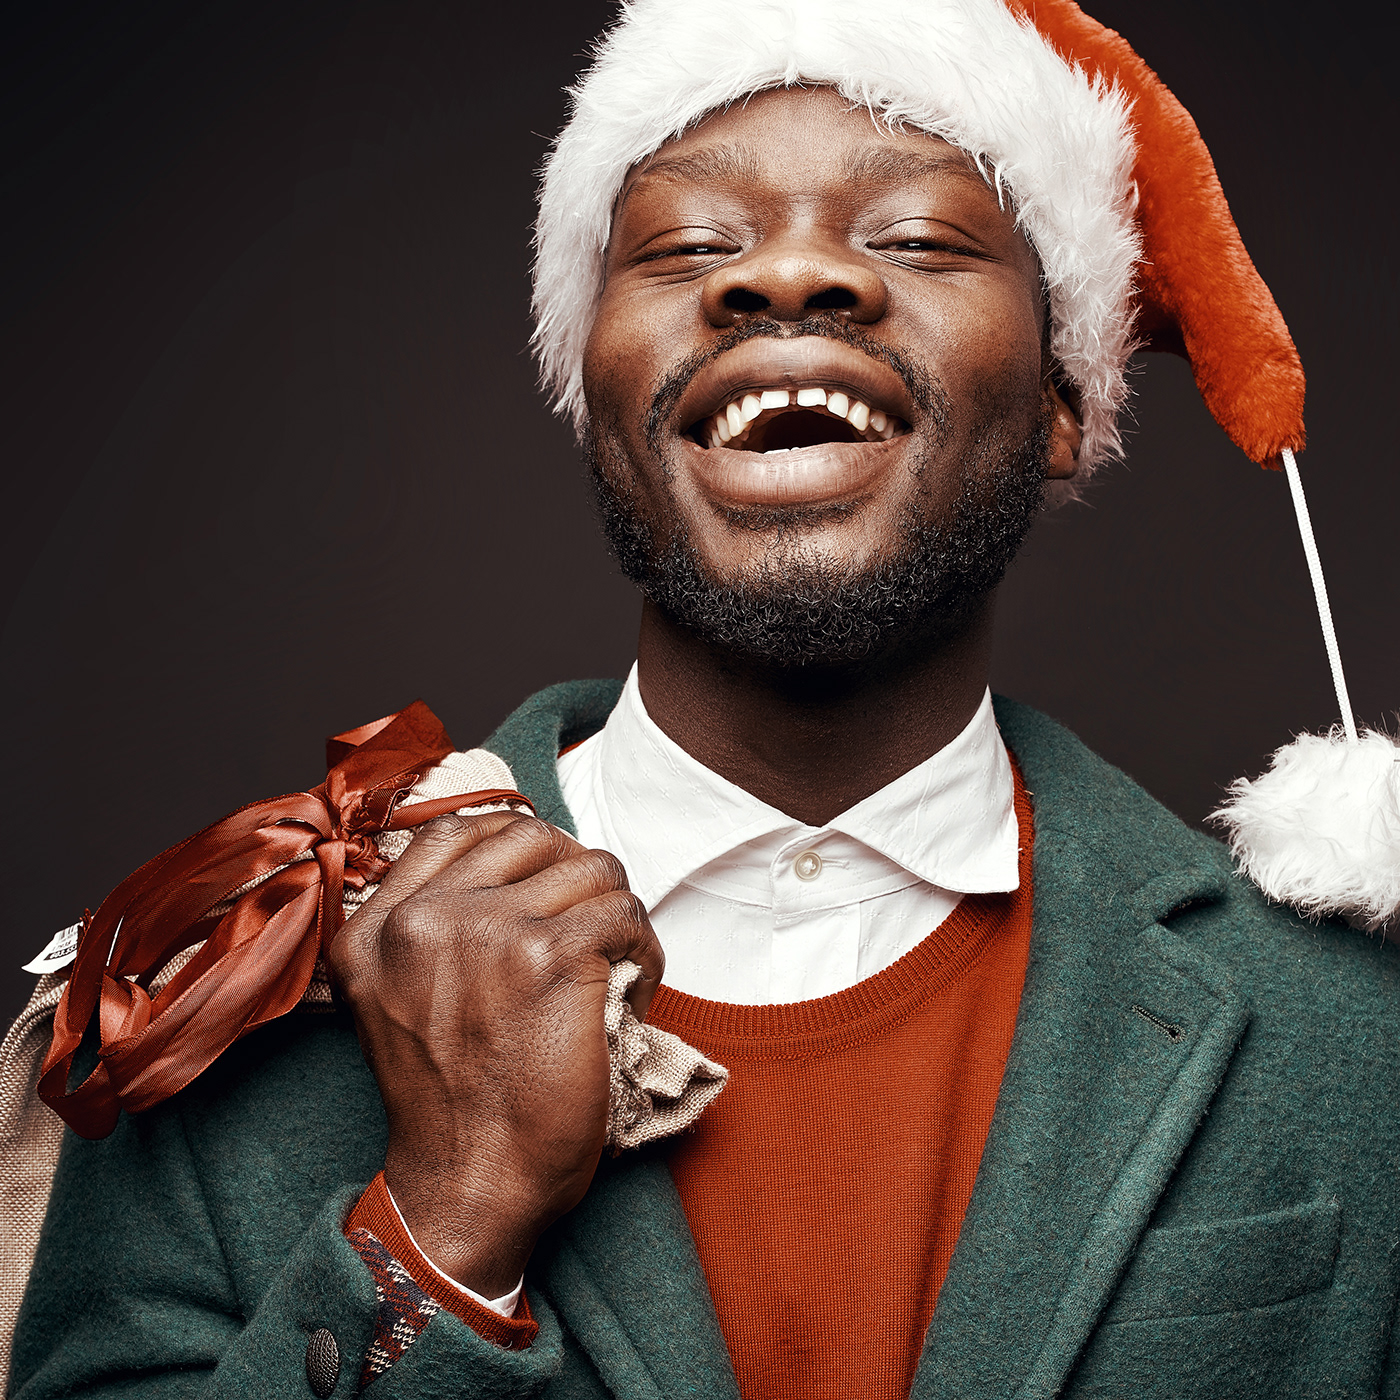 Santa / фото Ярослав Мончак